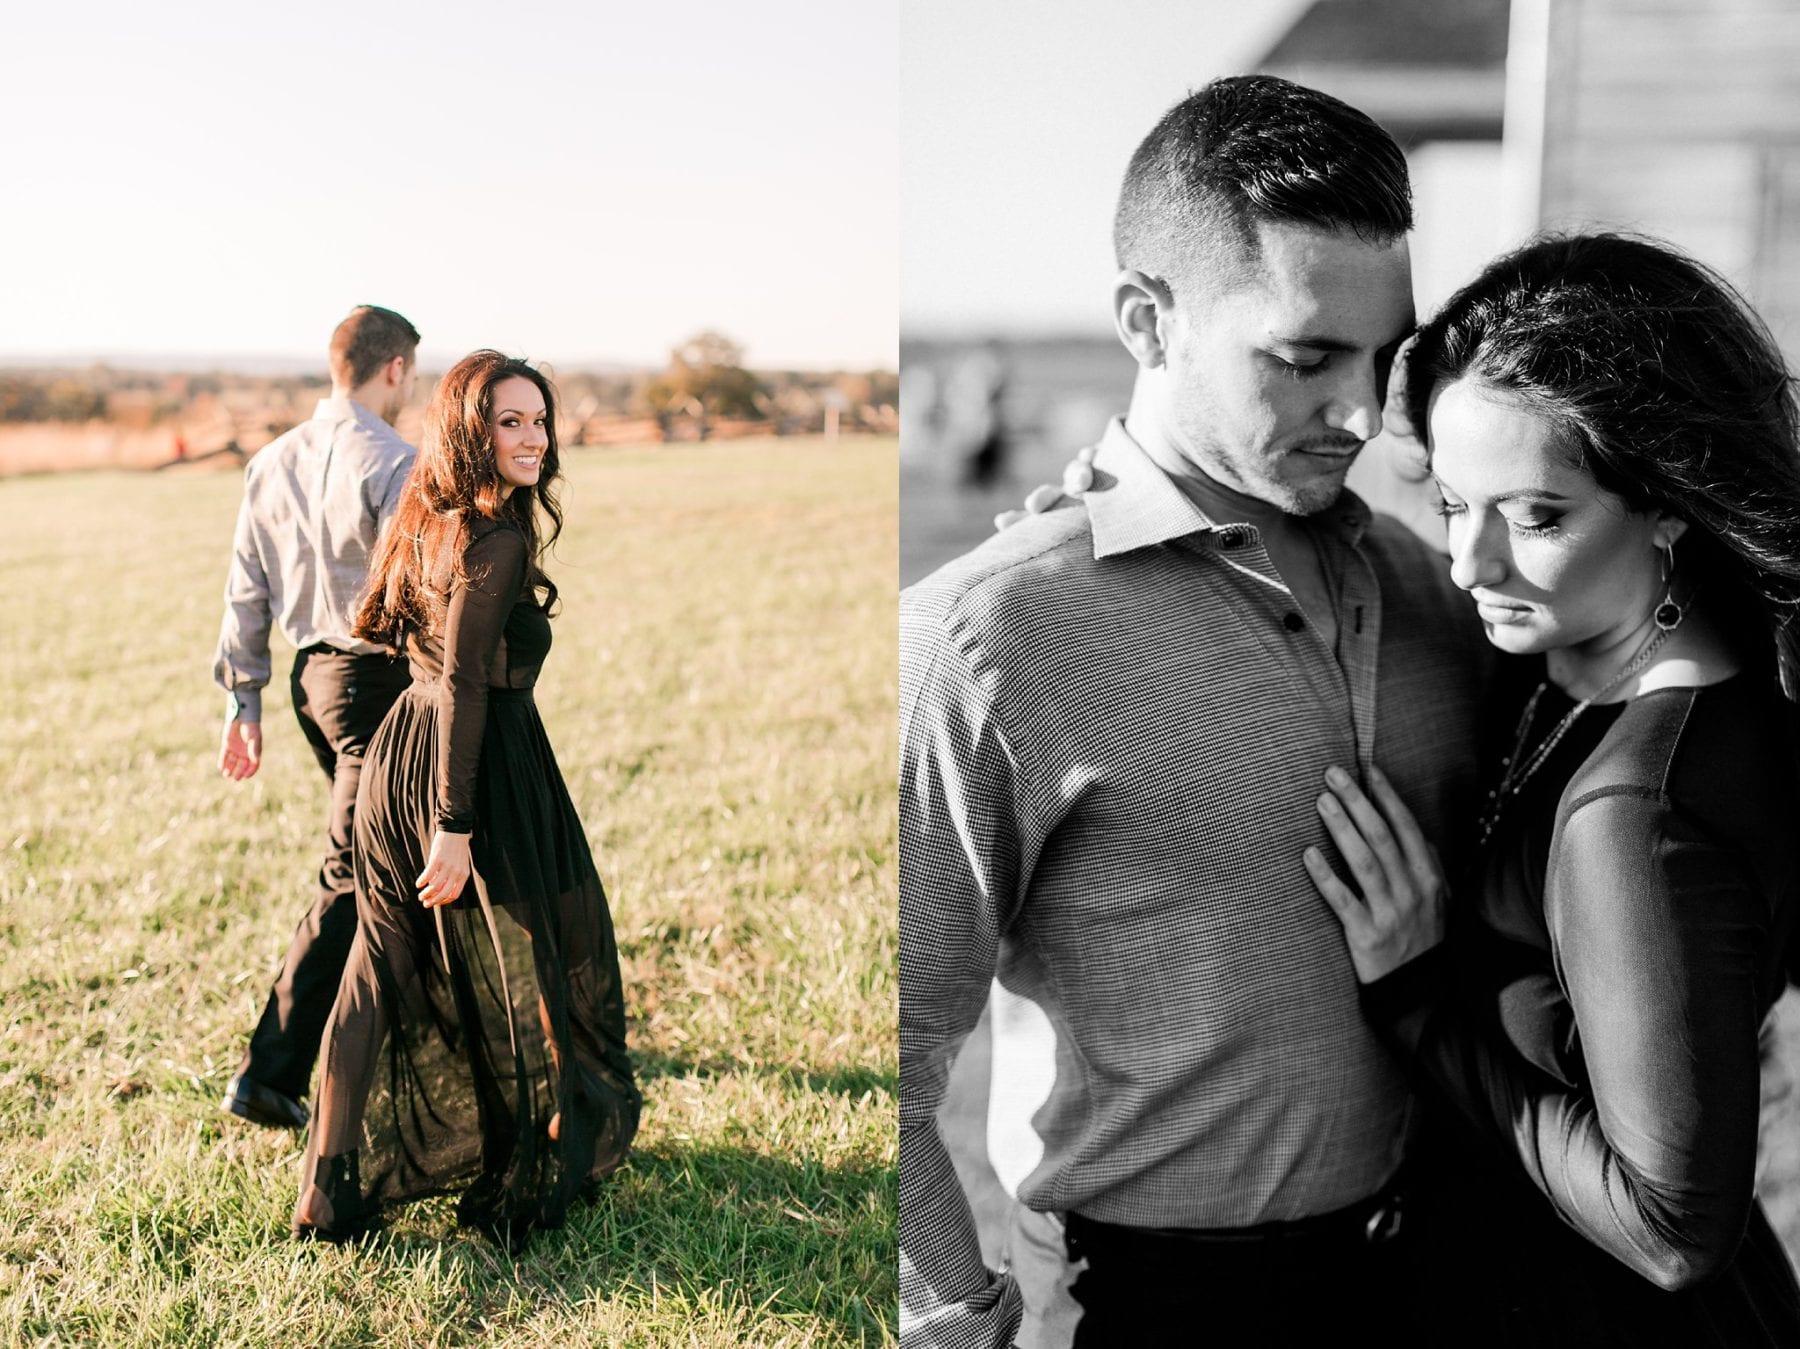 Manassas Battlefield Portraits Virginia Wedding Photographer Megan Kelsey Photography Lianne & Chris-90.jpg